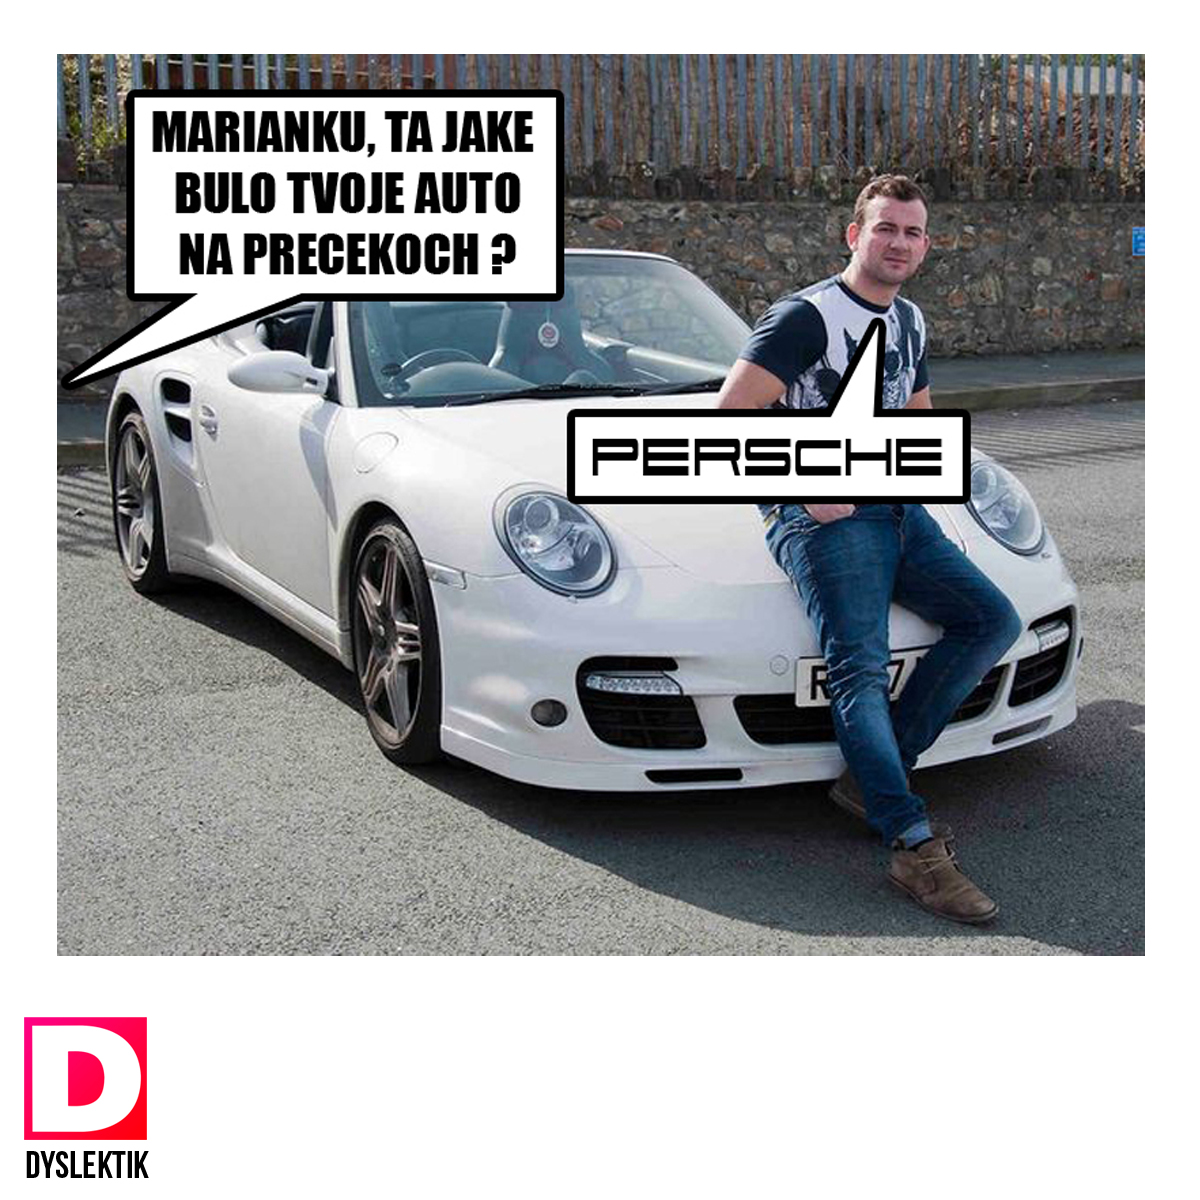 persche